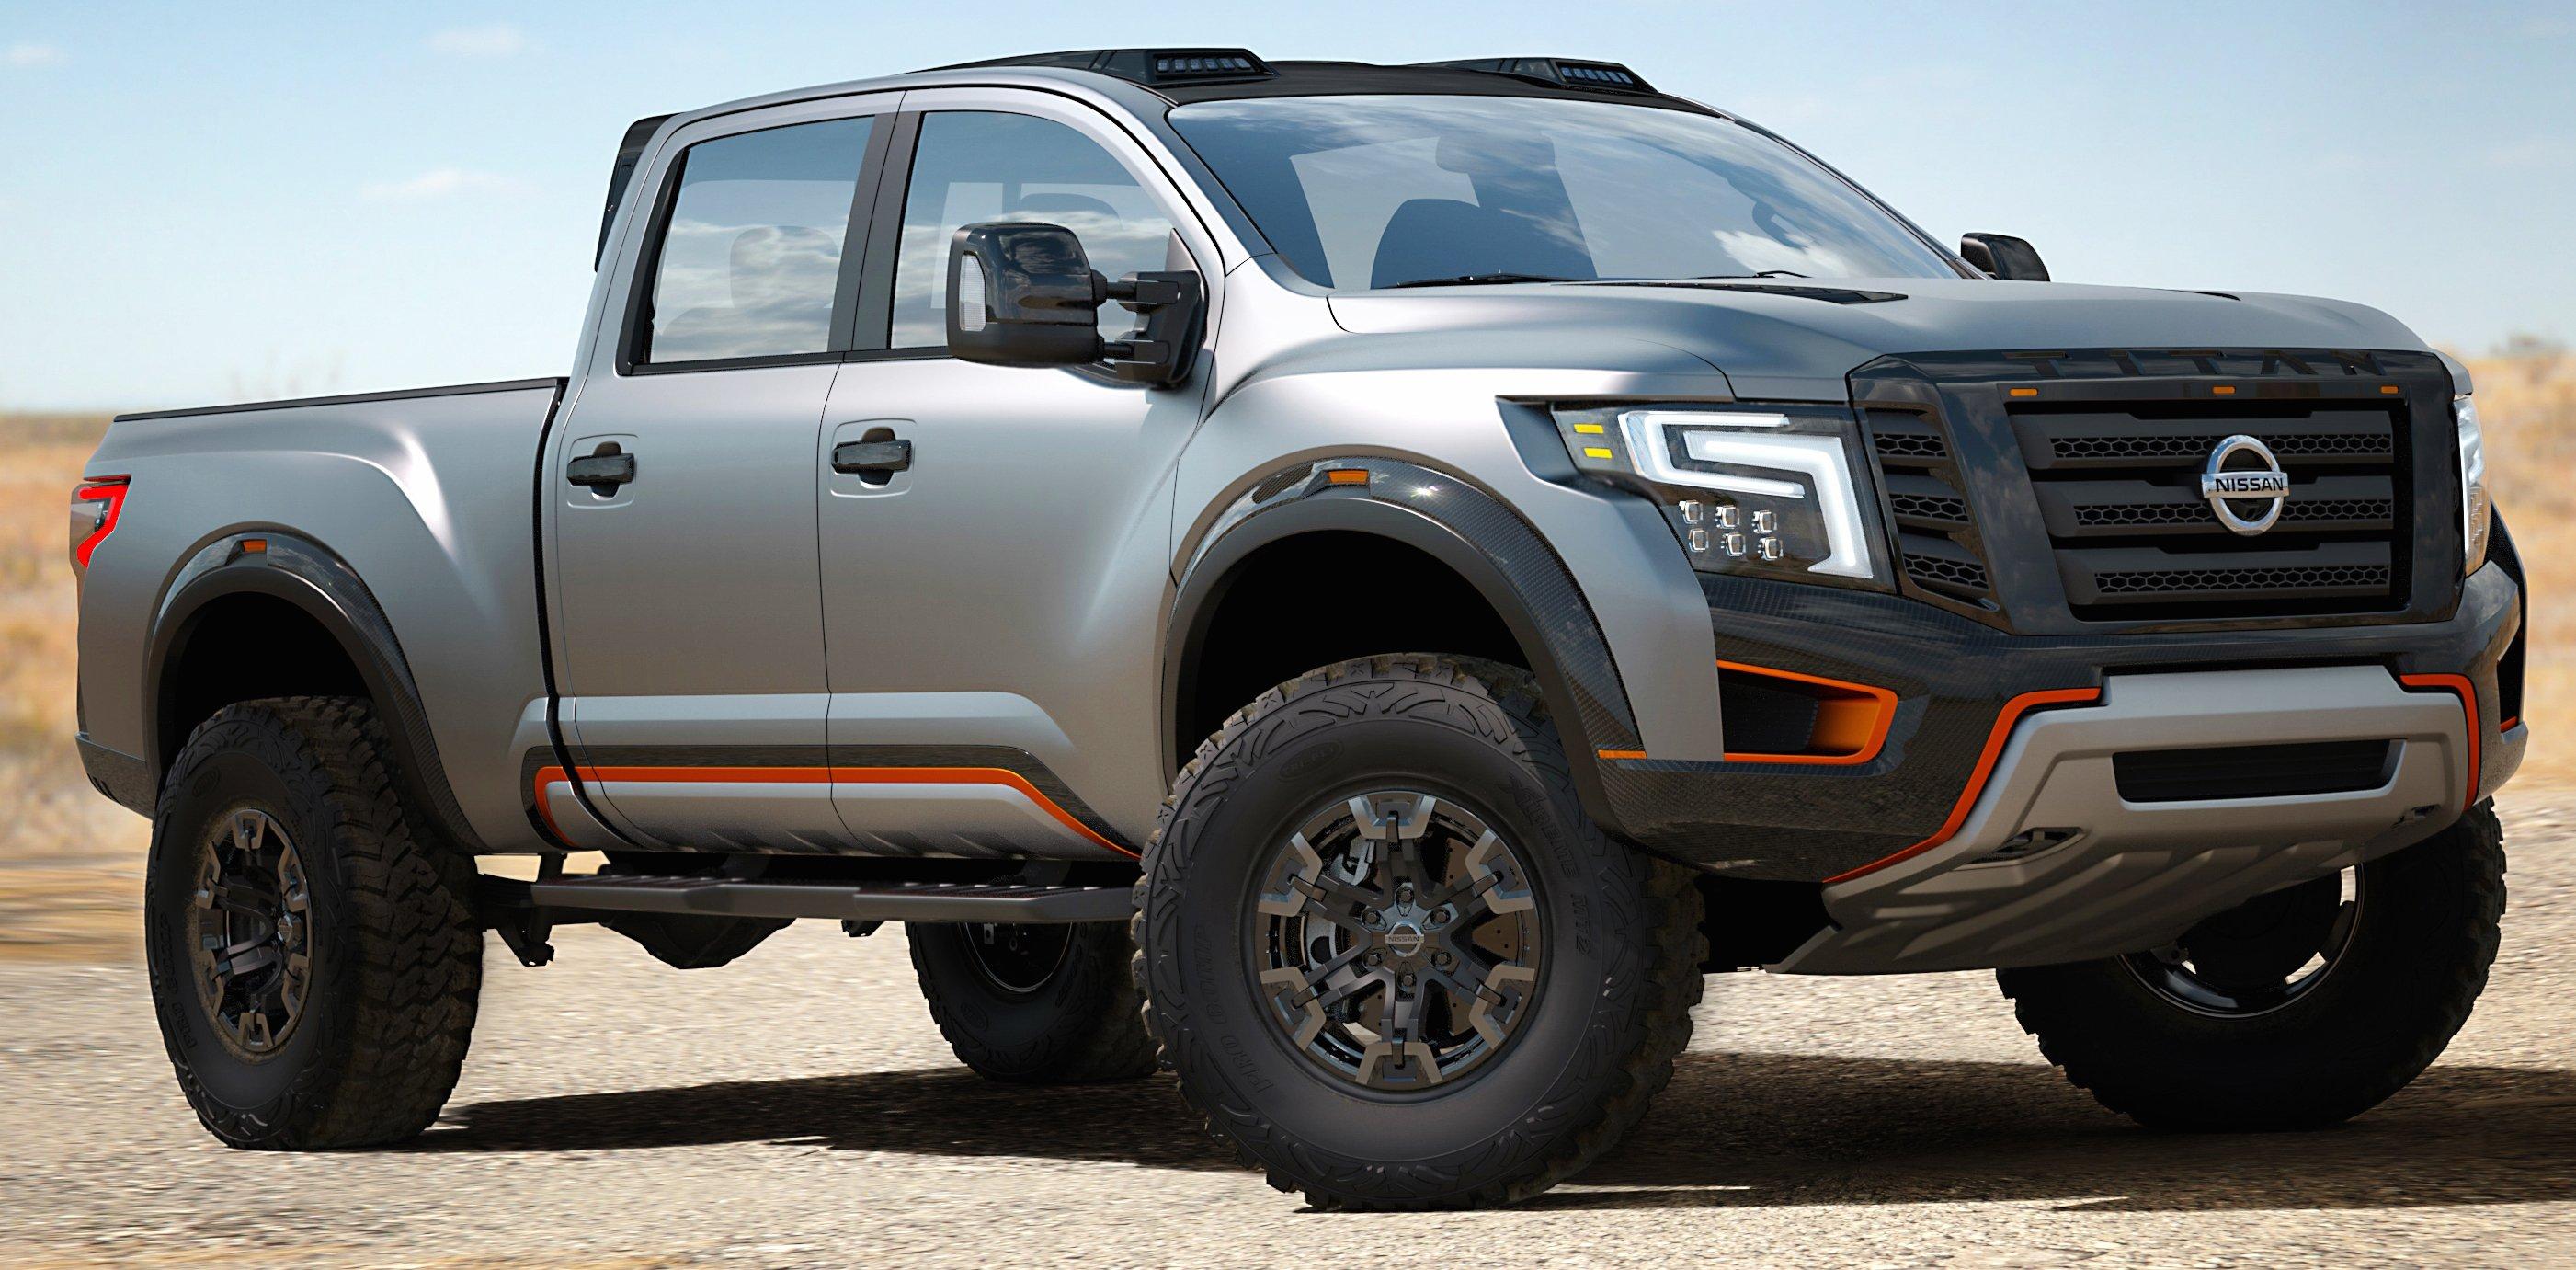 Nissan Titan Warrior Concept could make production Paul ...